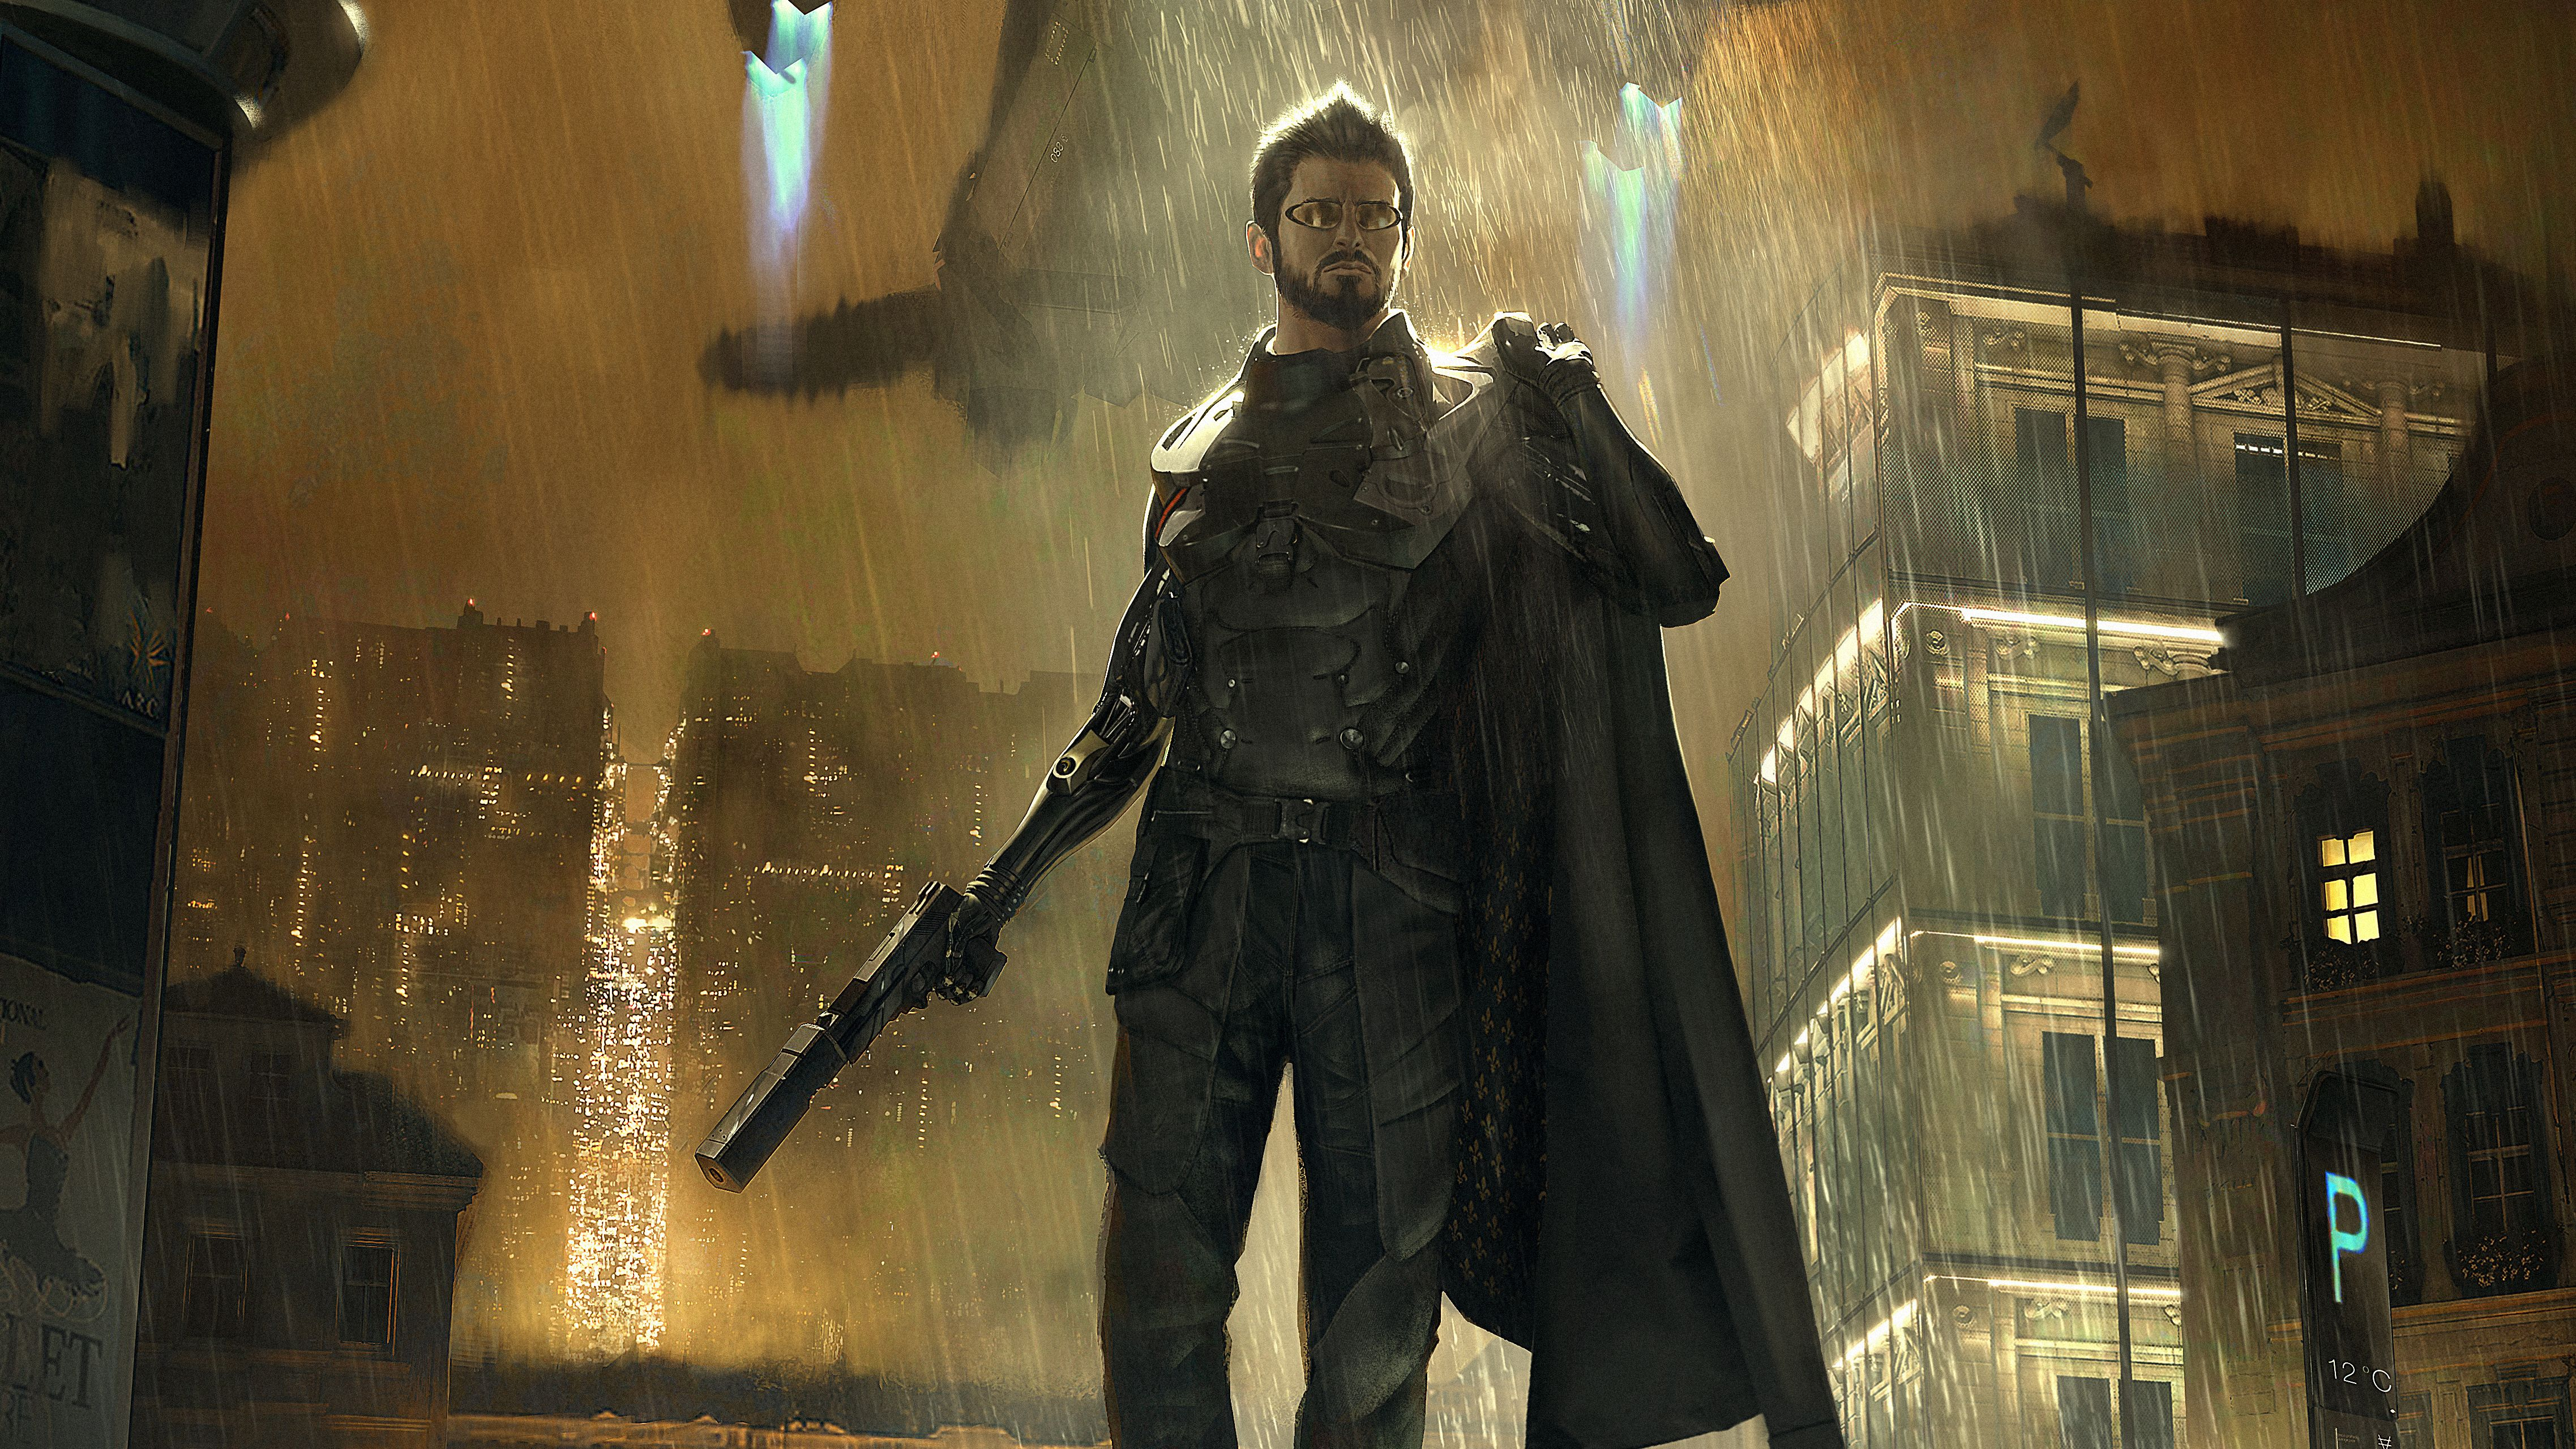 Deus Ex Mankind Divided Game Deus Ex Mankind Divided Game Wallpapers Deus Ex Mankind Deus Ex Mankind Divided Deus Ex